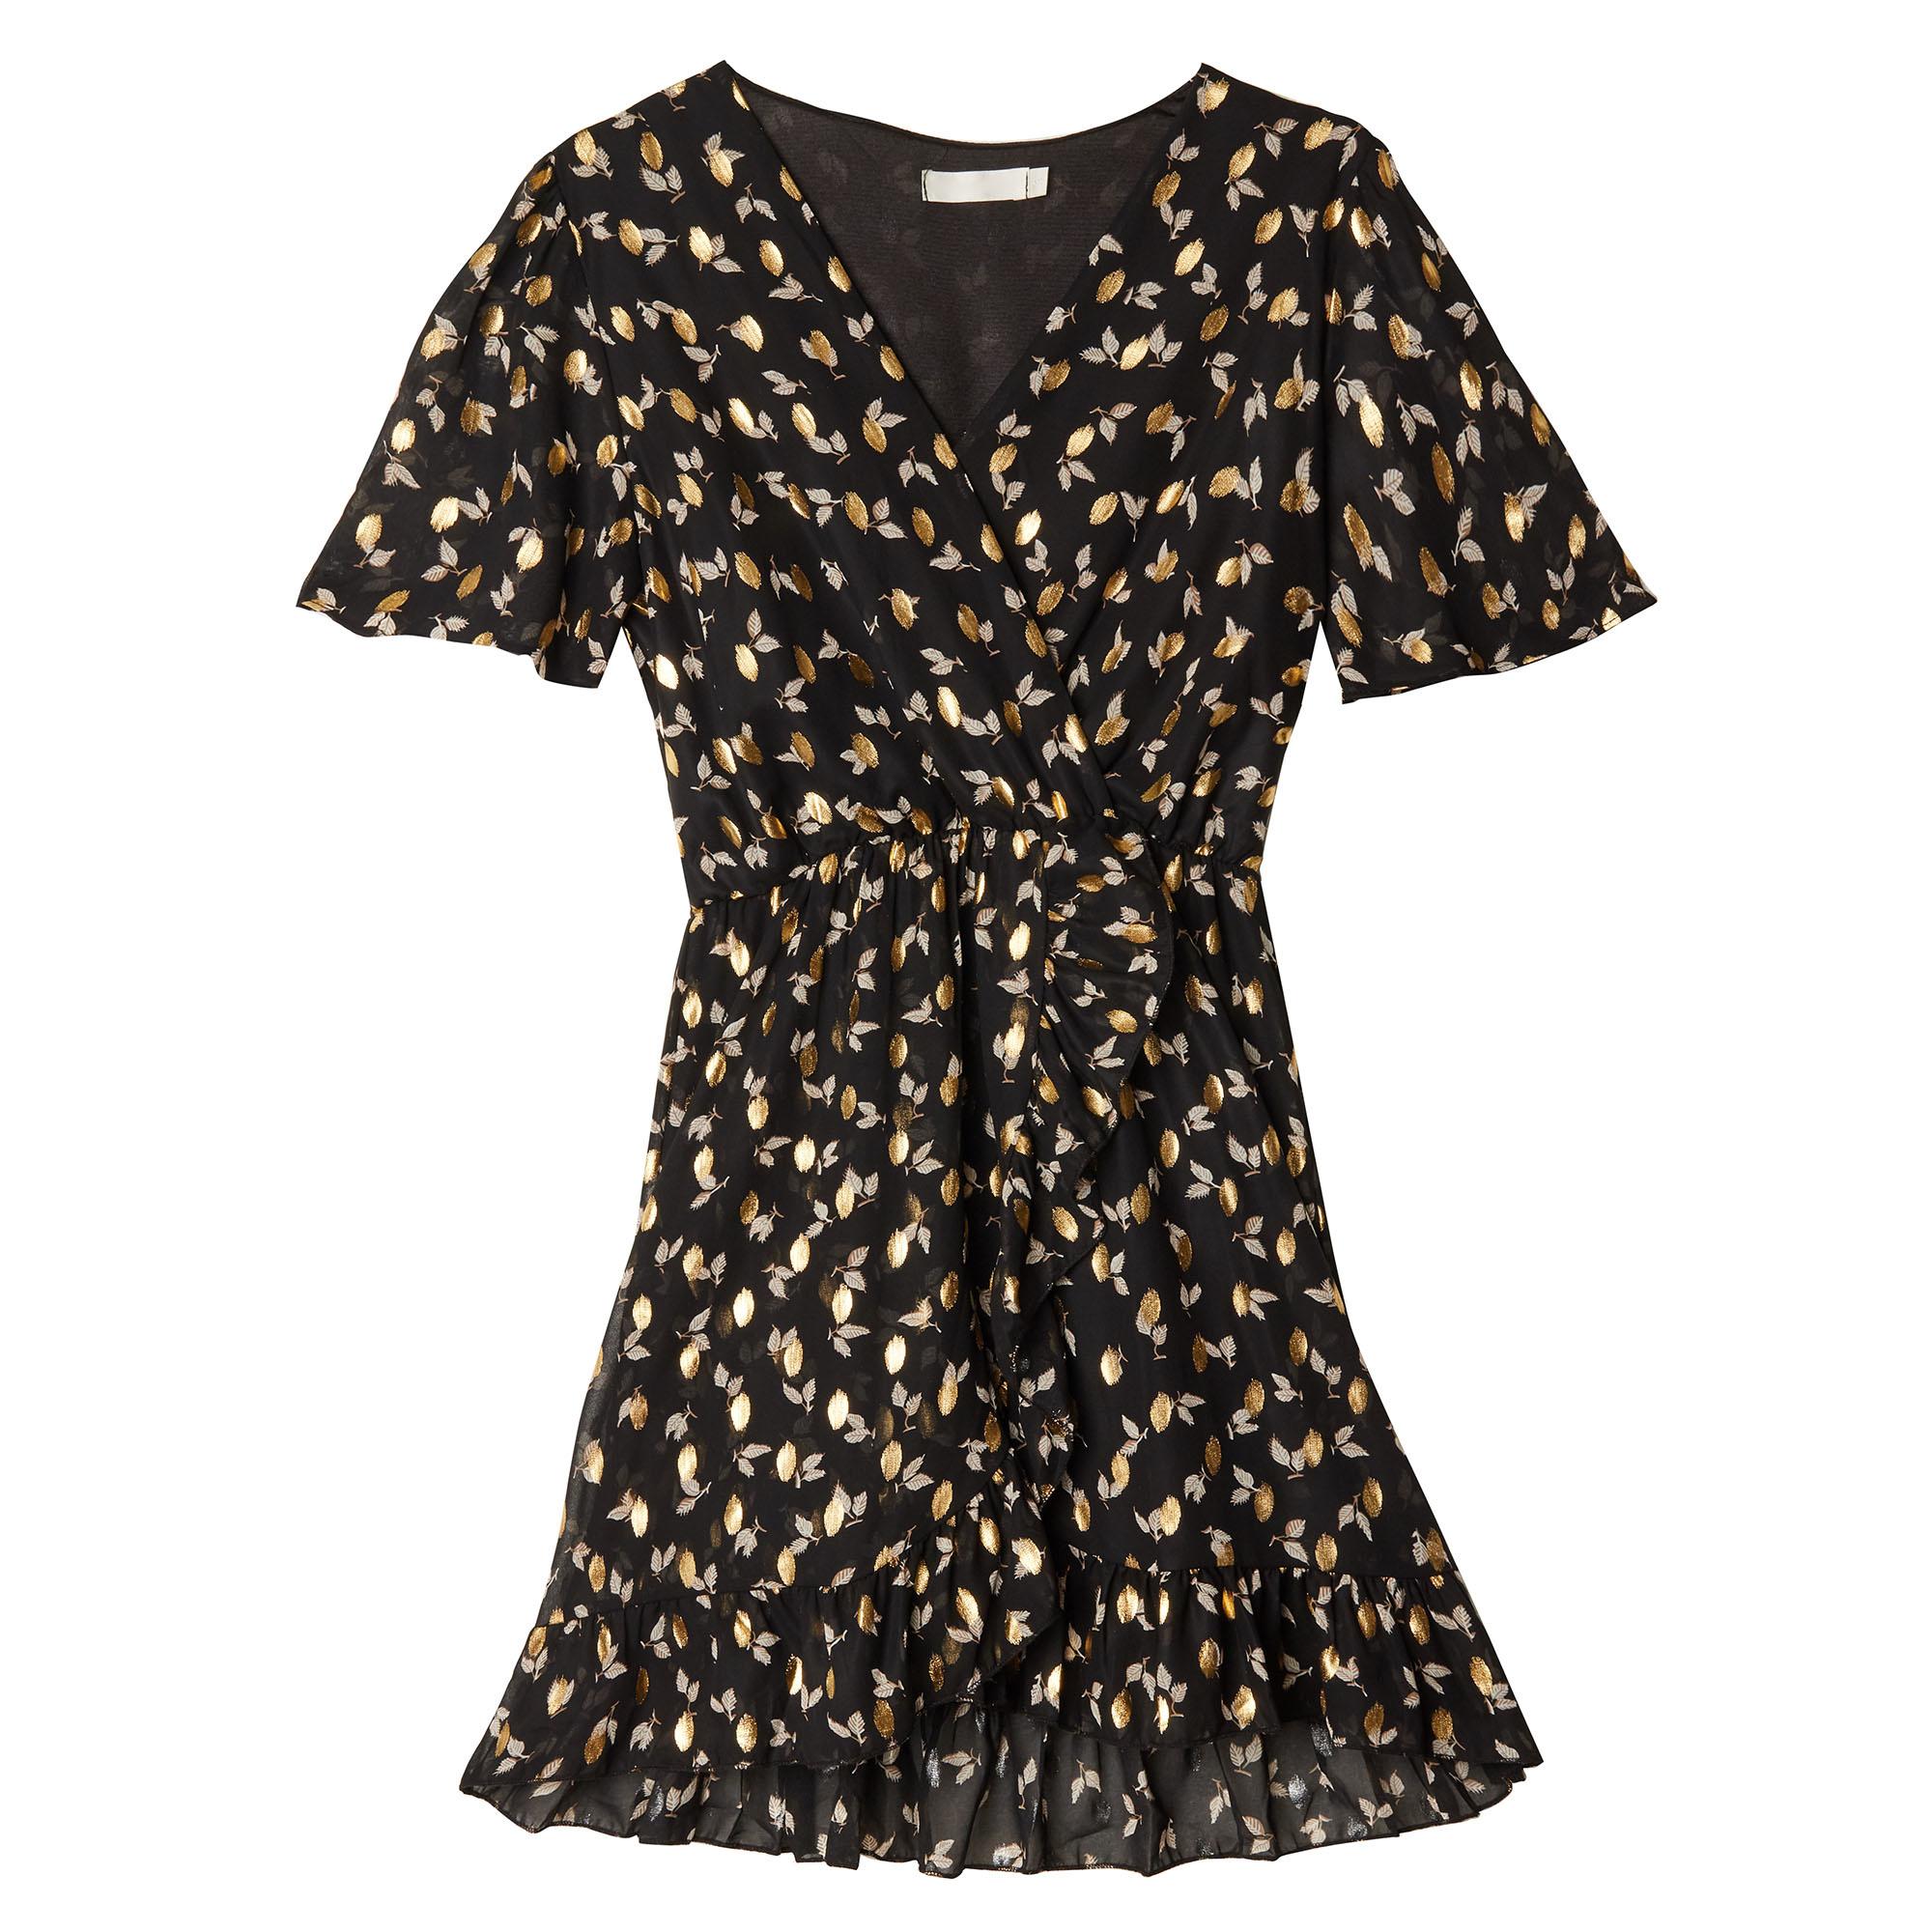 YW Axelle New Style Dress Black